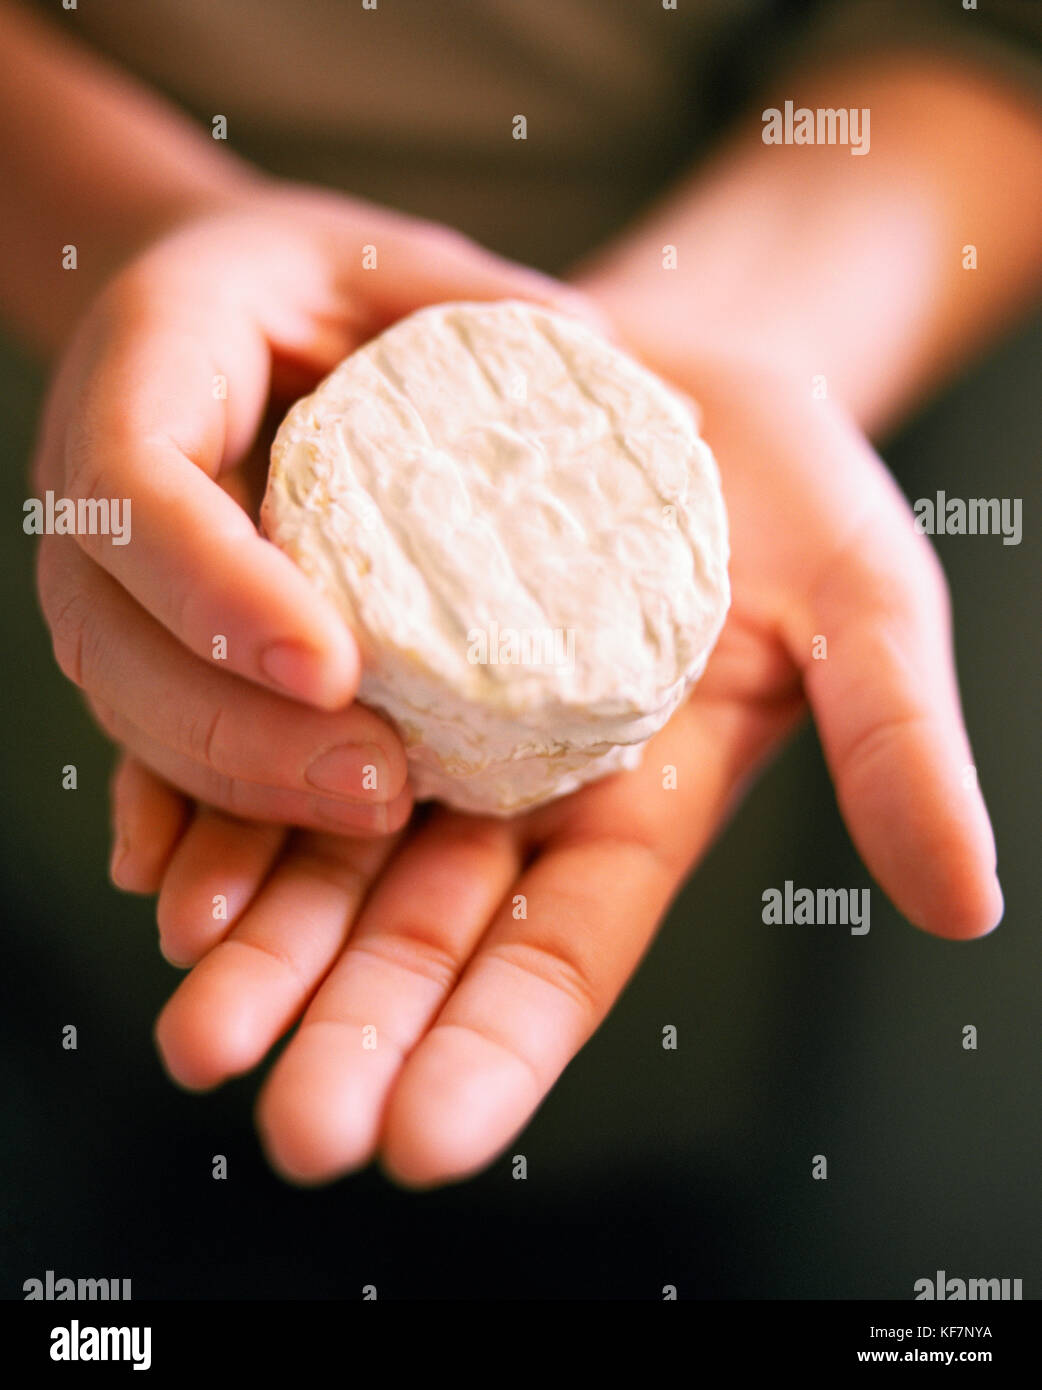 USA, California, Sebastopol, wheel of Redwood Hill Boucheret cheese, Redwood Hill Farm and Creamery - Stock Image